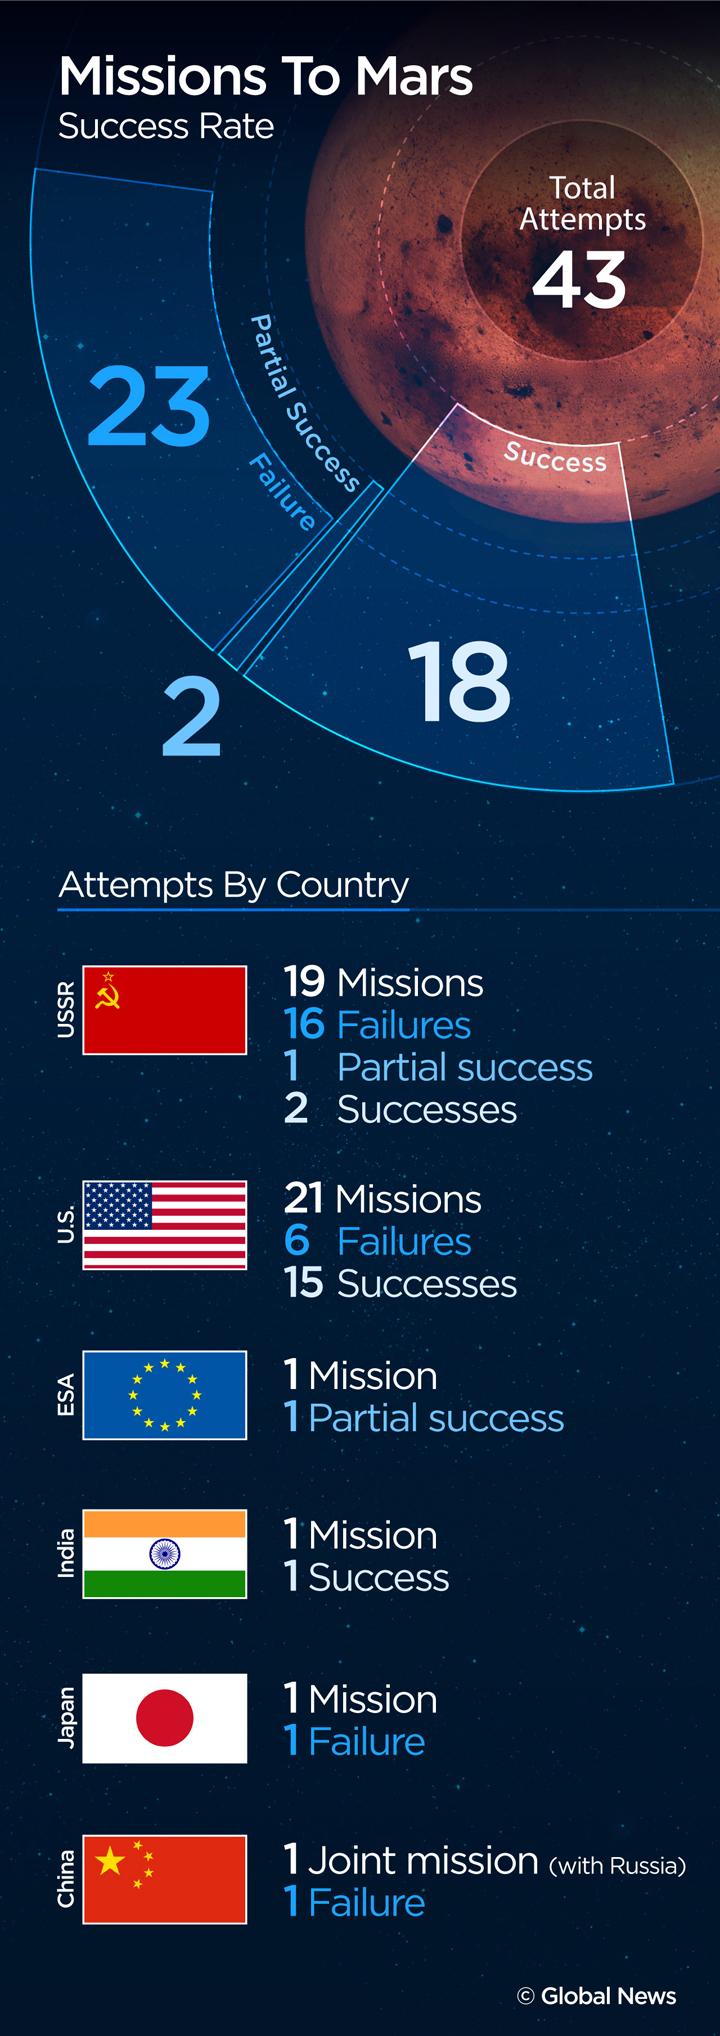 Mars-missions-success